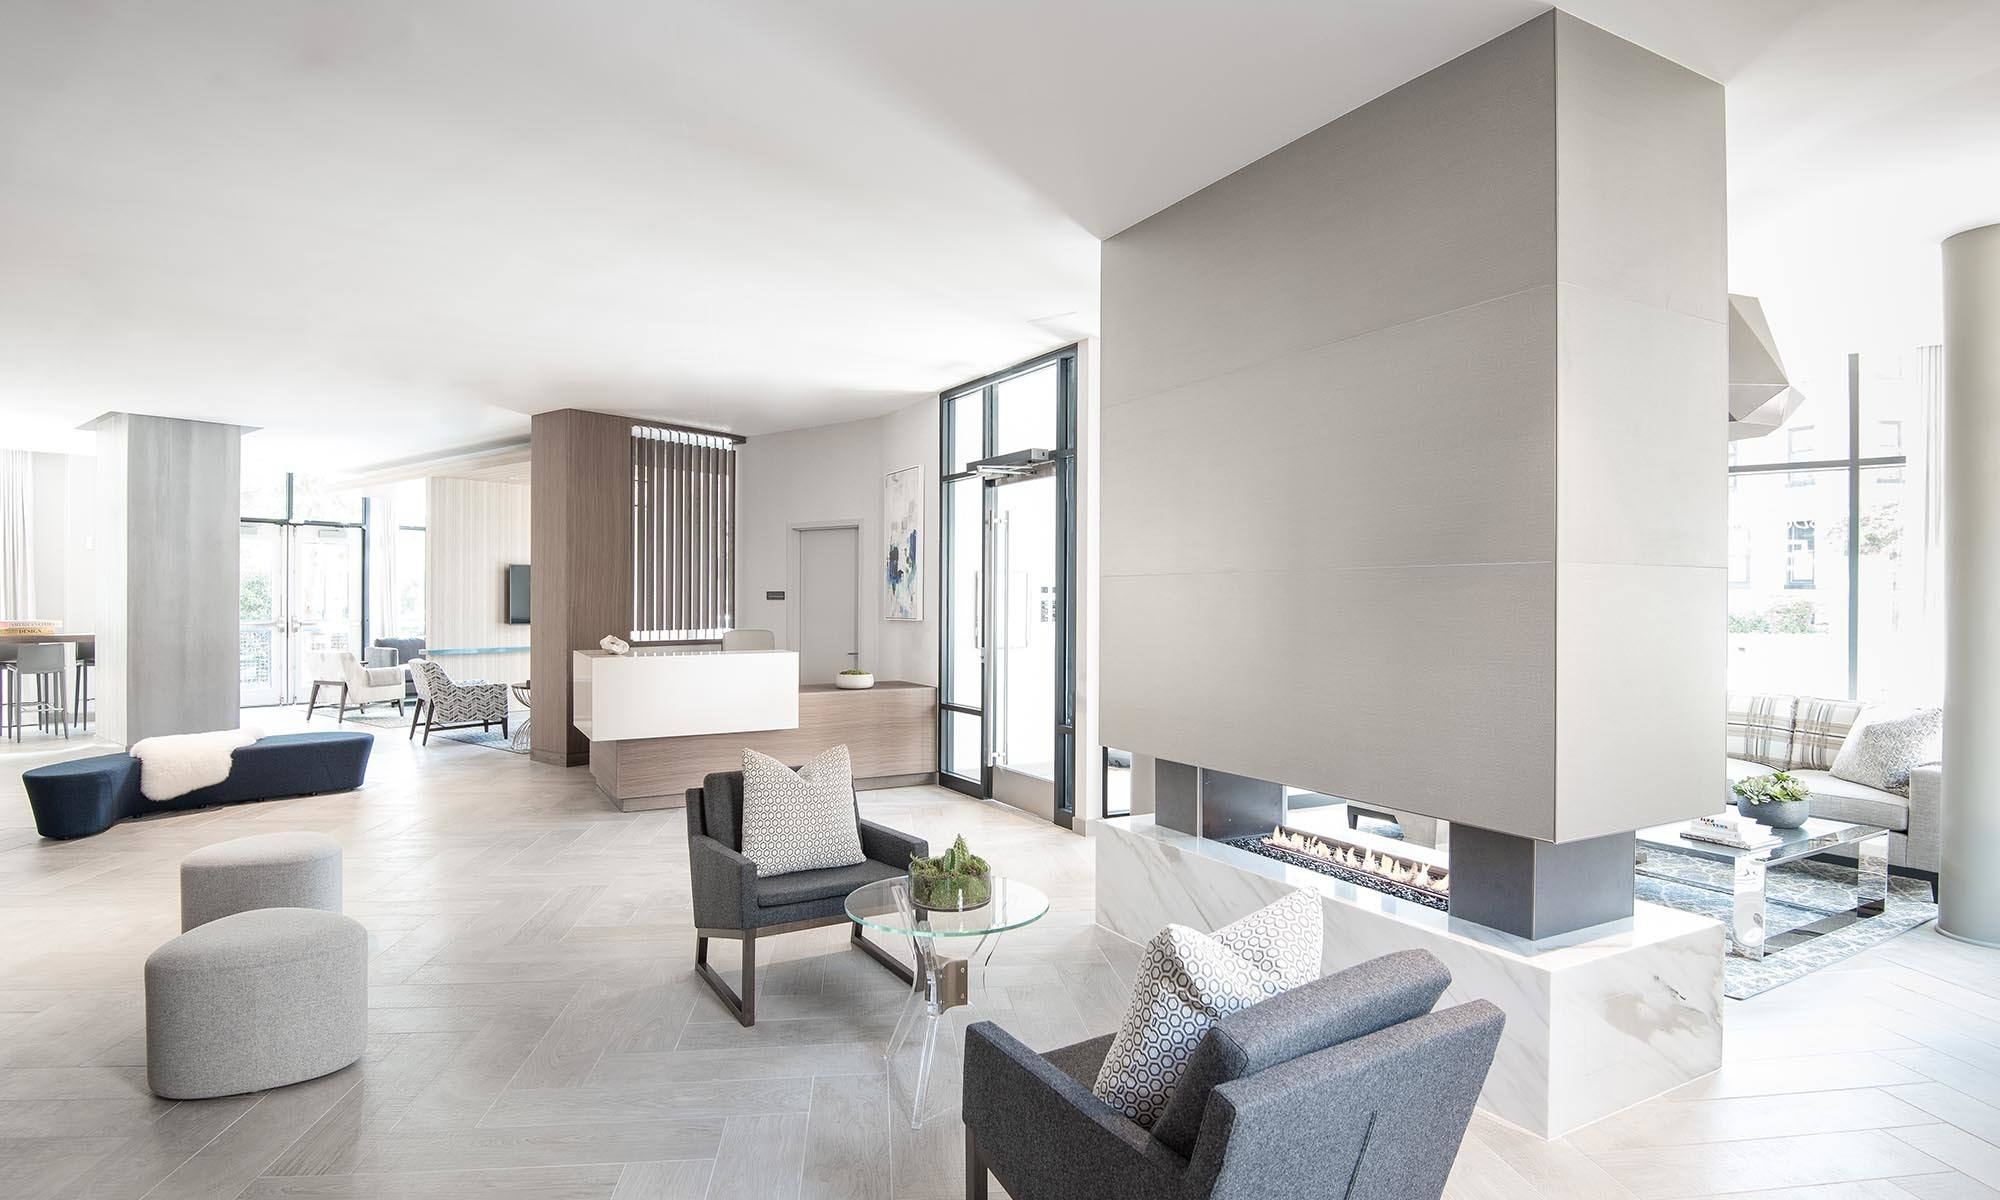 Top 30 2 Bedroom House For Rent Washington Dc 2 Bedroom